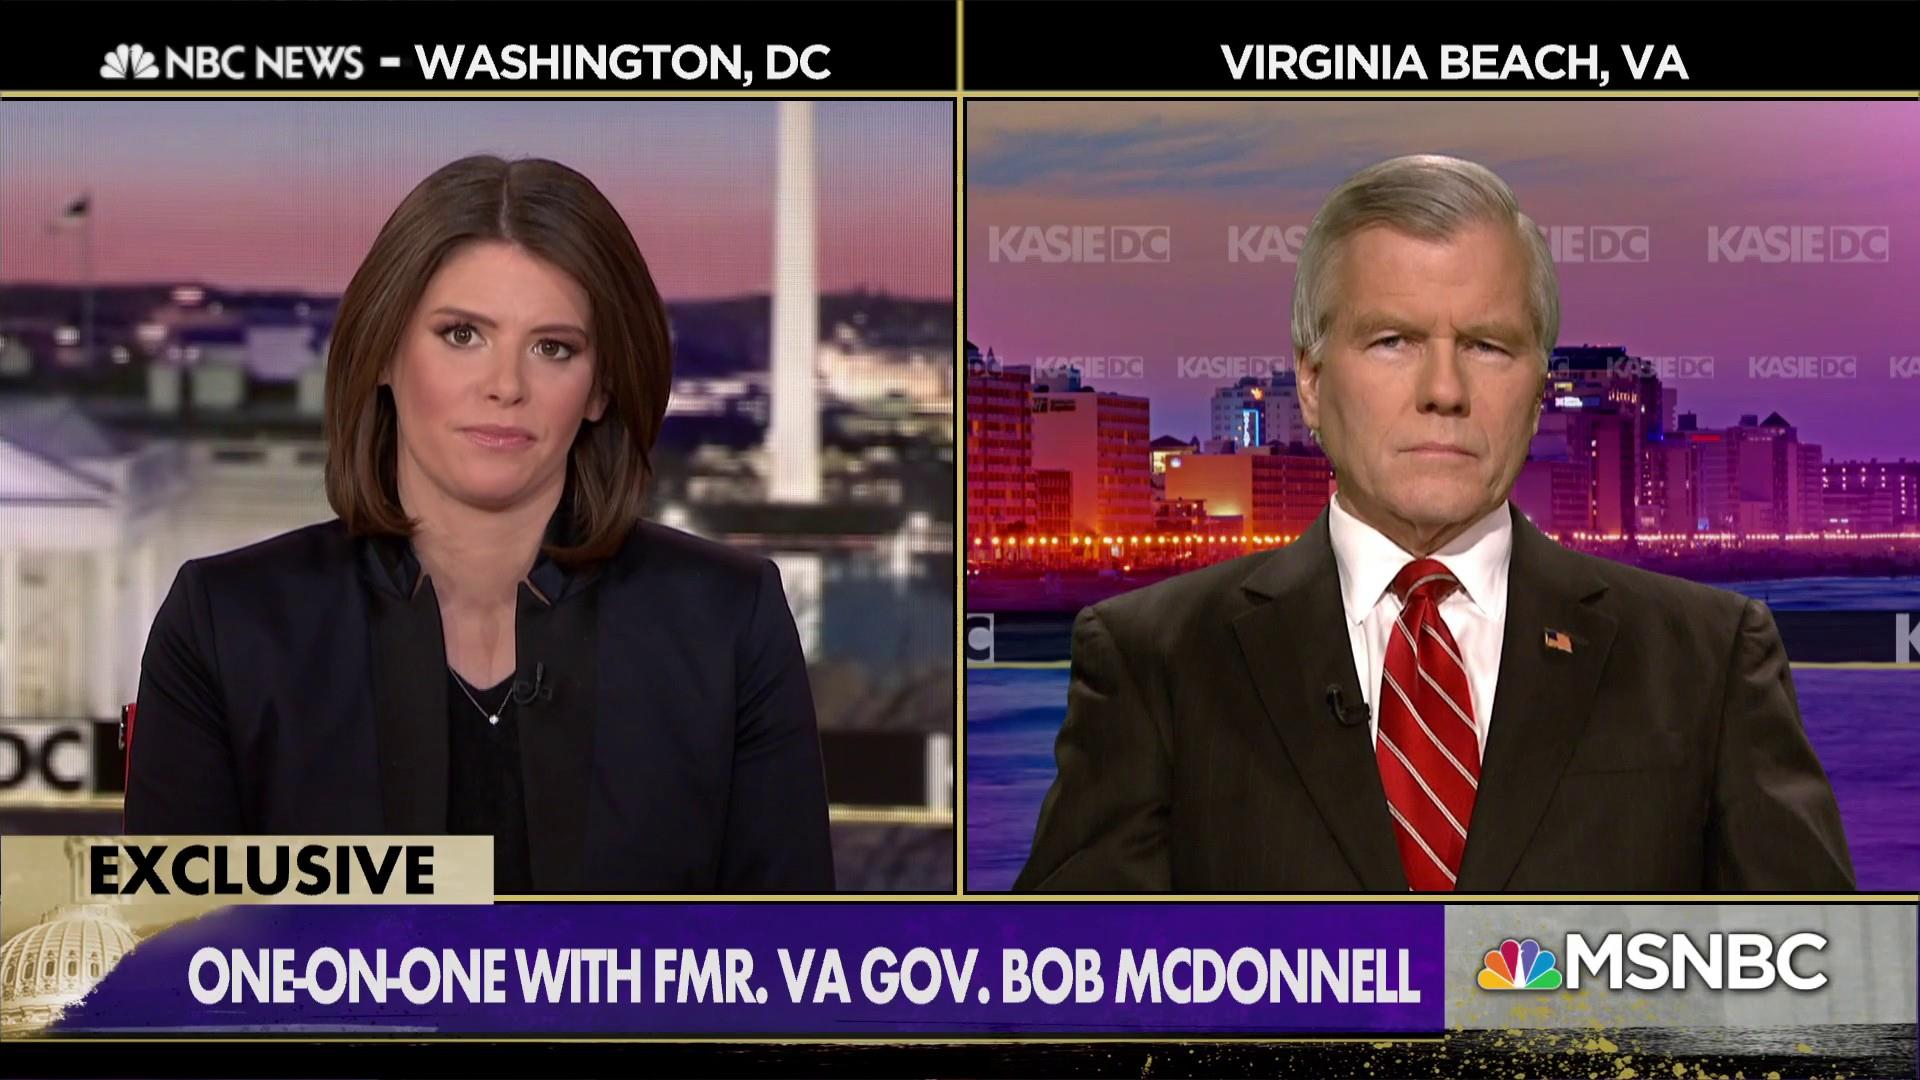 Fmr. VA Gov. McDonnell calls for investigation into Fairfax allegations